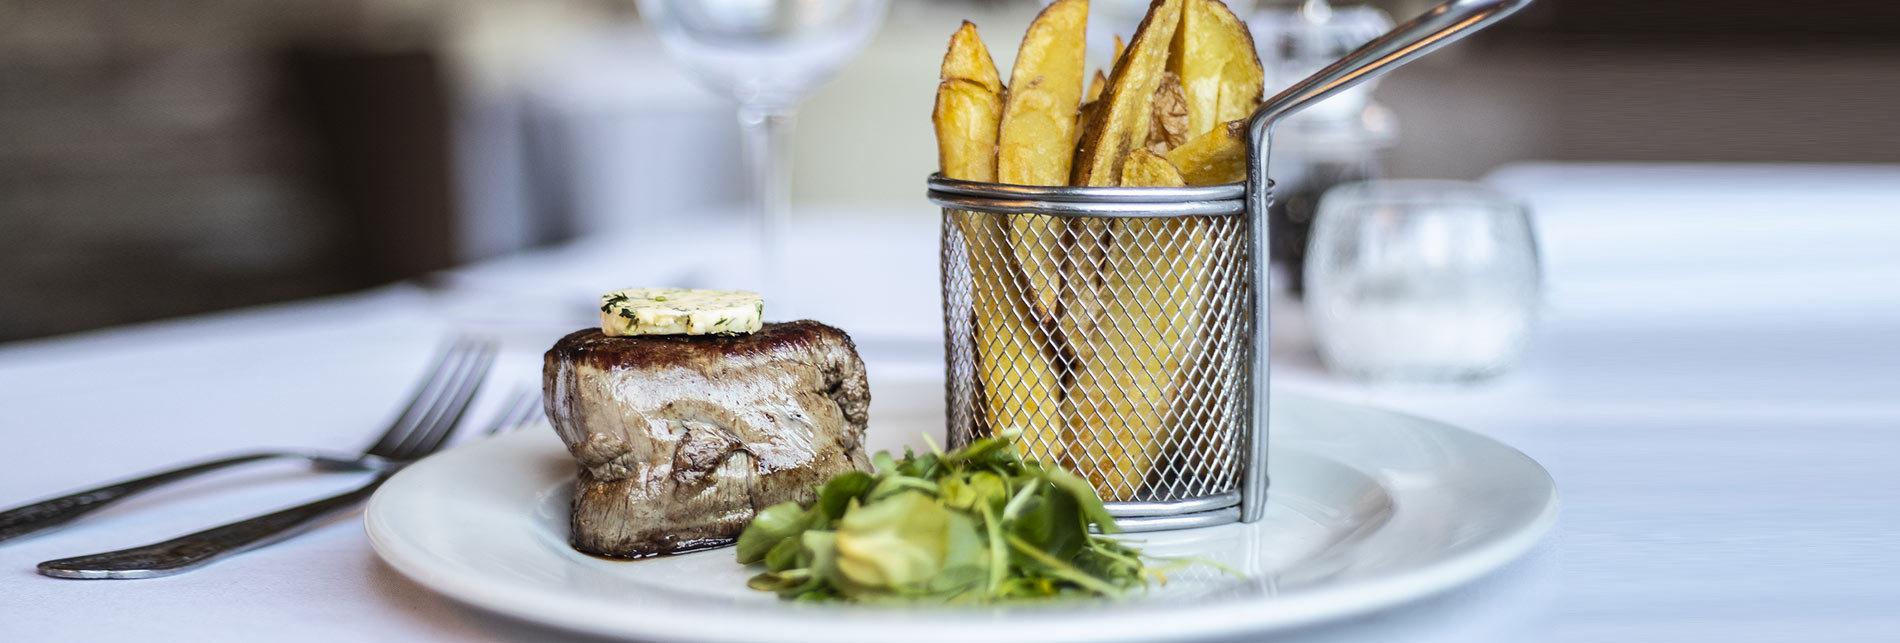 Shoeburyness-Hotel-Home-Slider-steak.jpg